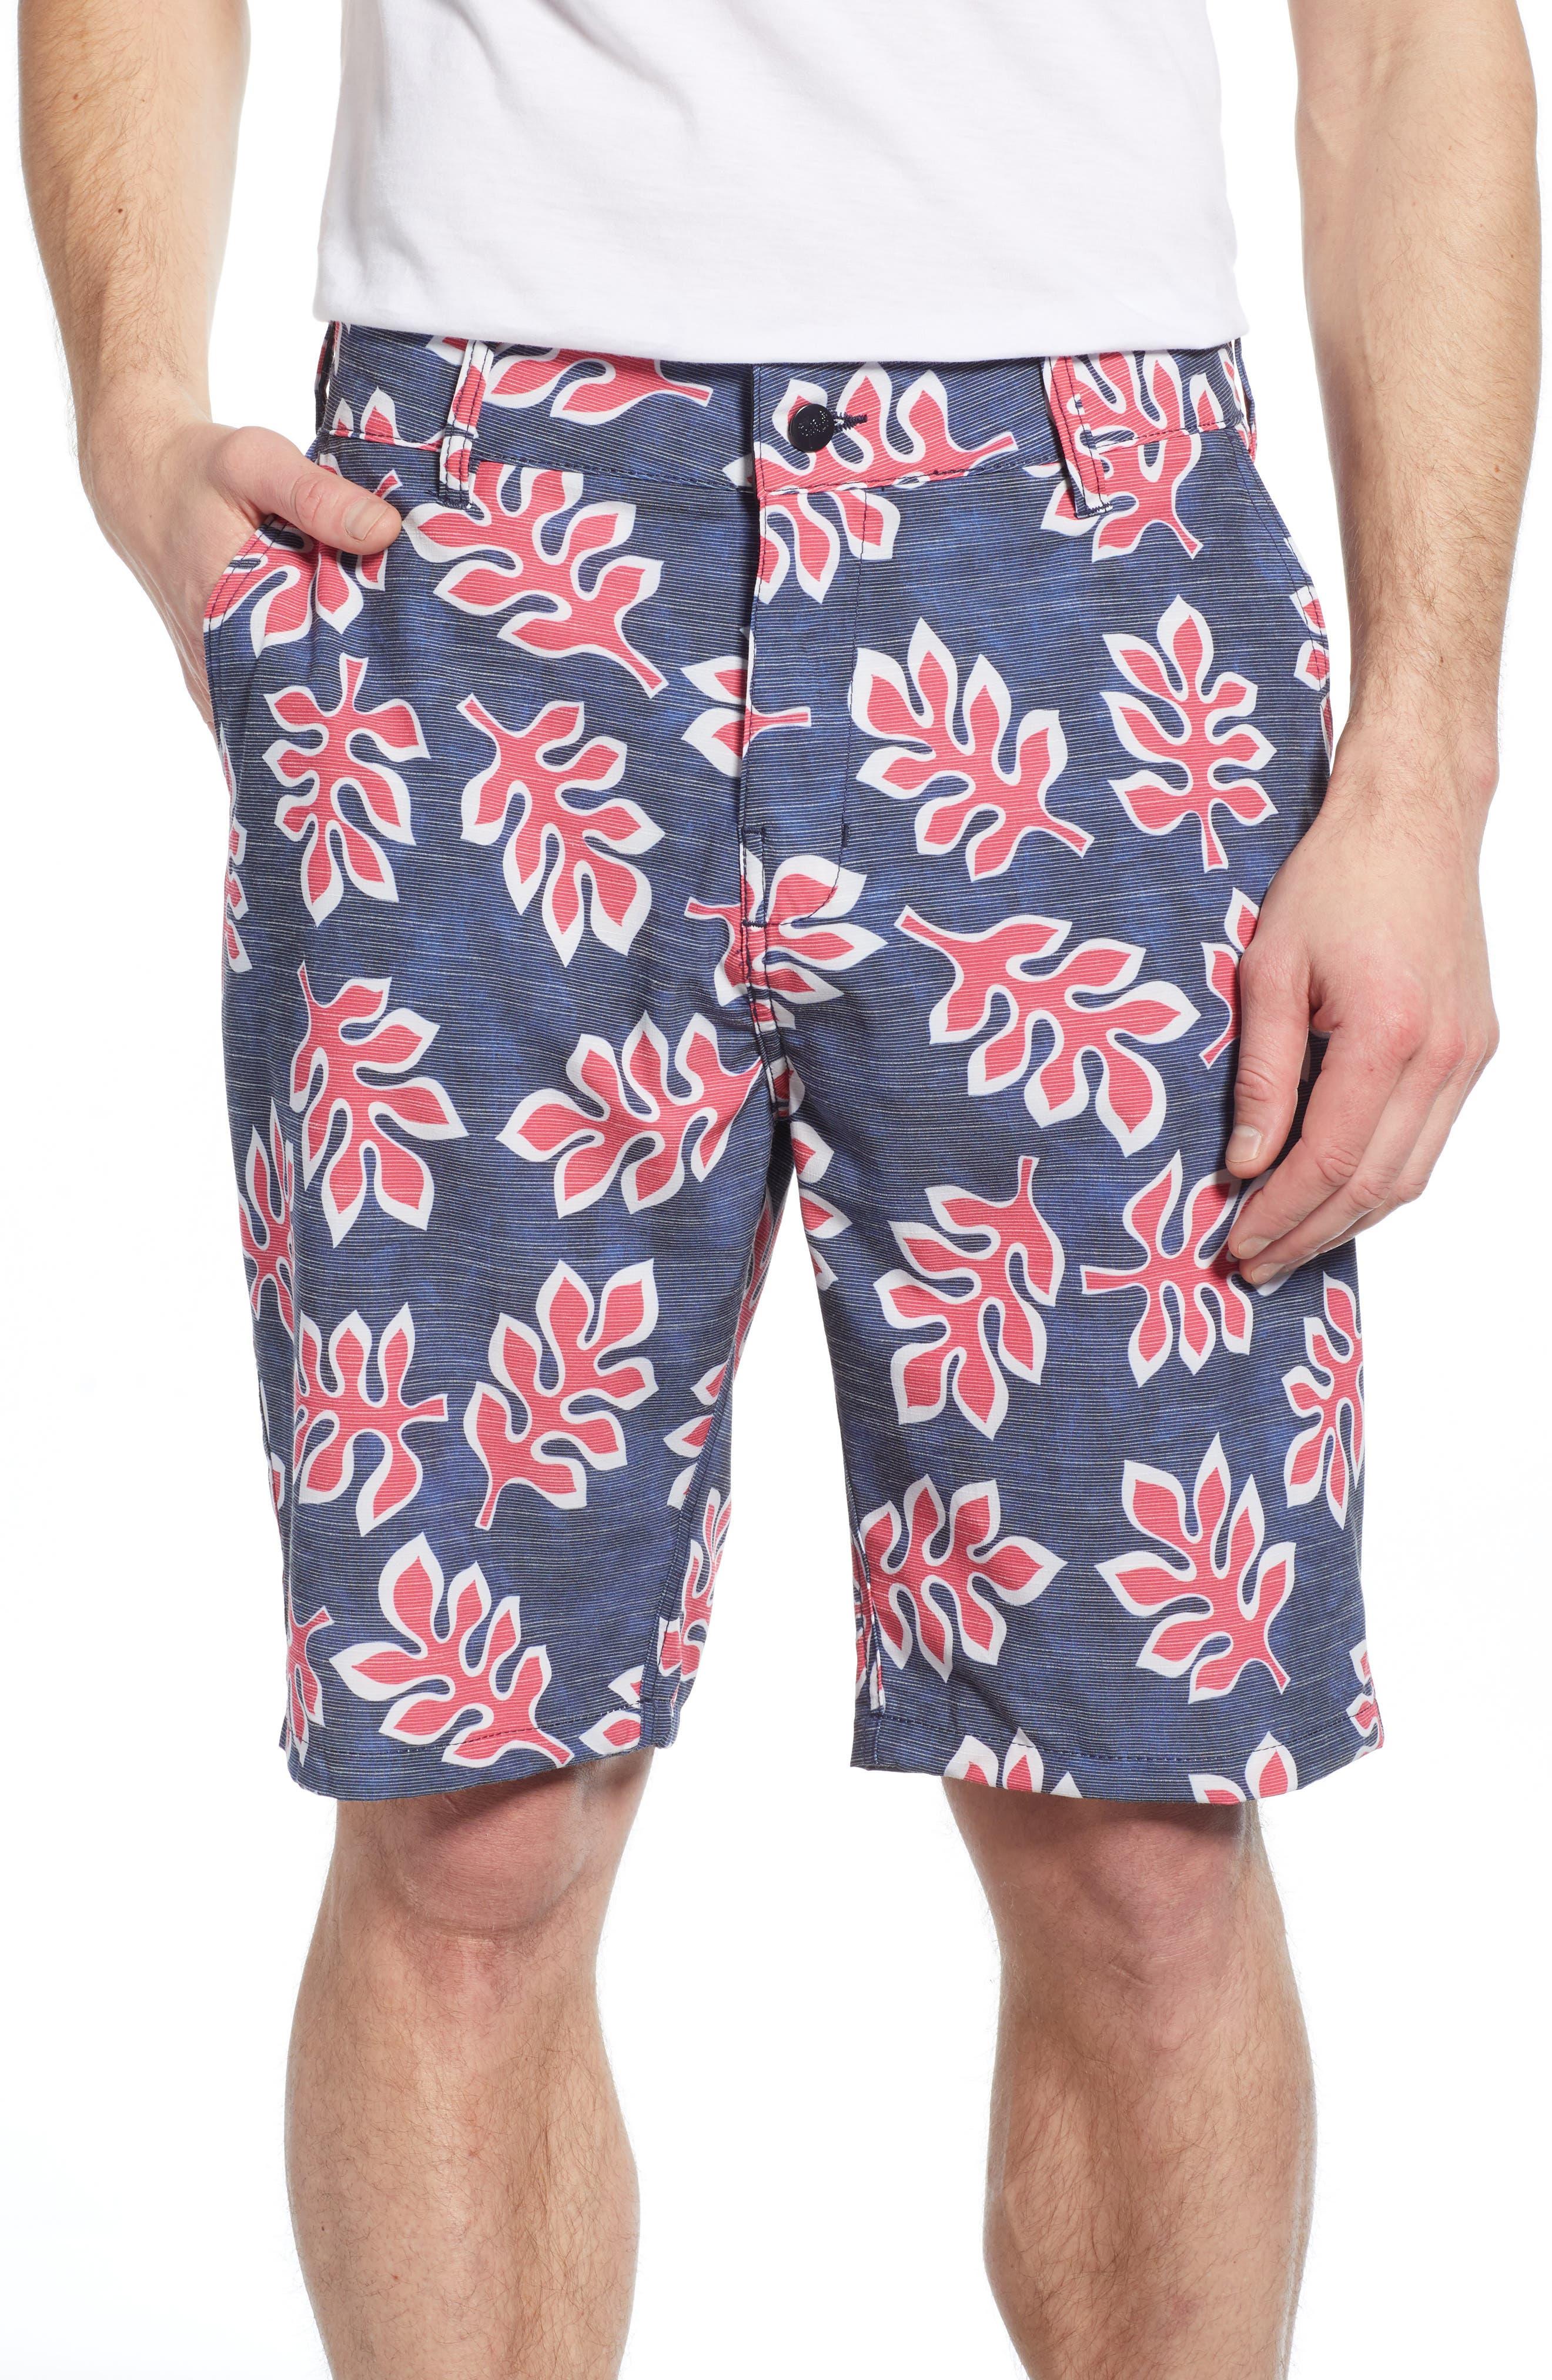 Trunks Surf & Swim Co. Hybrid Shorts, Blue